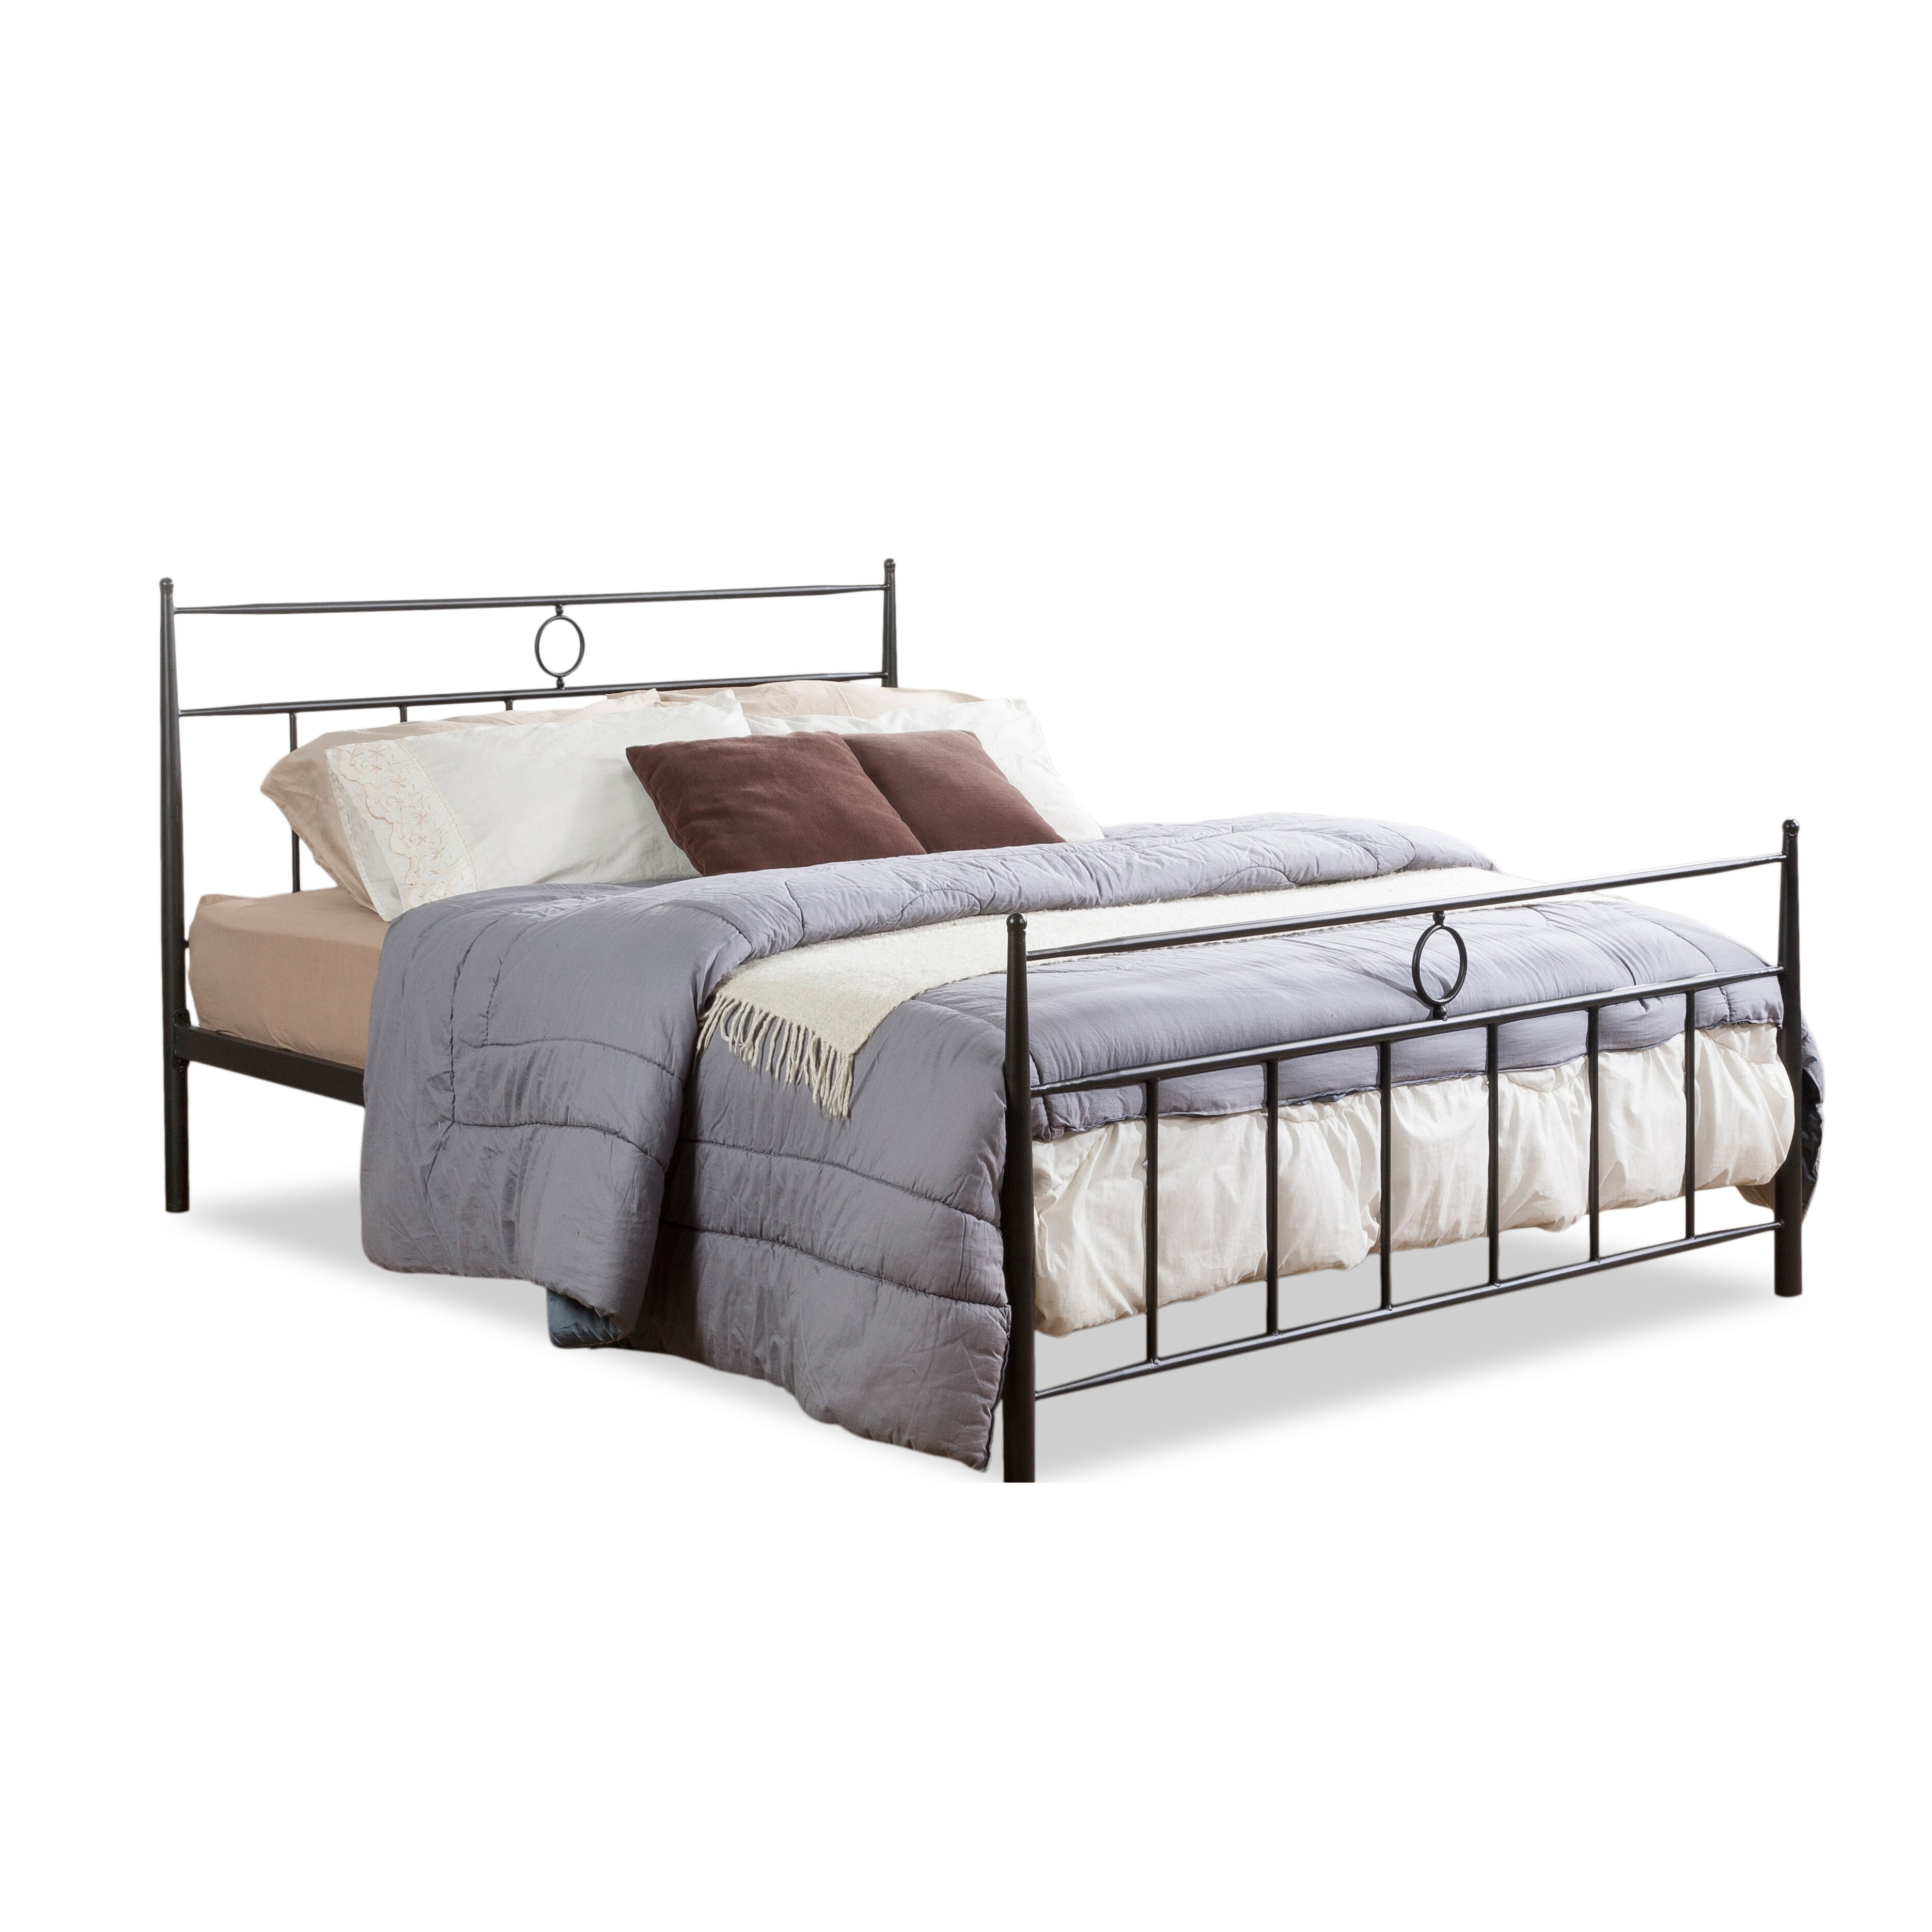 wholesale interiors baxton studio platform bed reviews. Black Bedroom Furniture Sets. Home Design Ideas